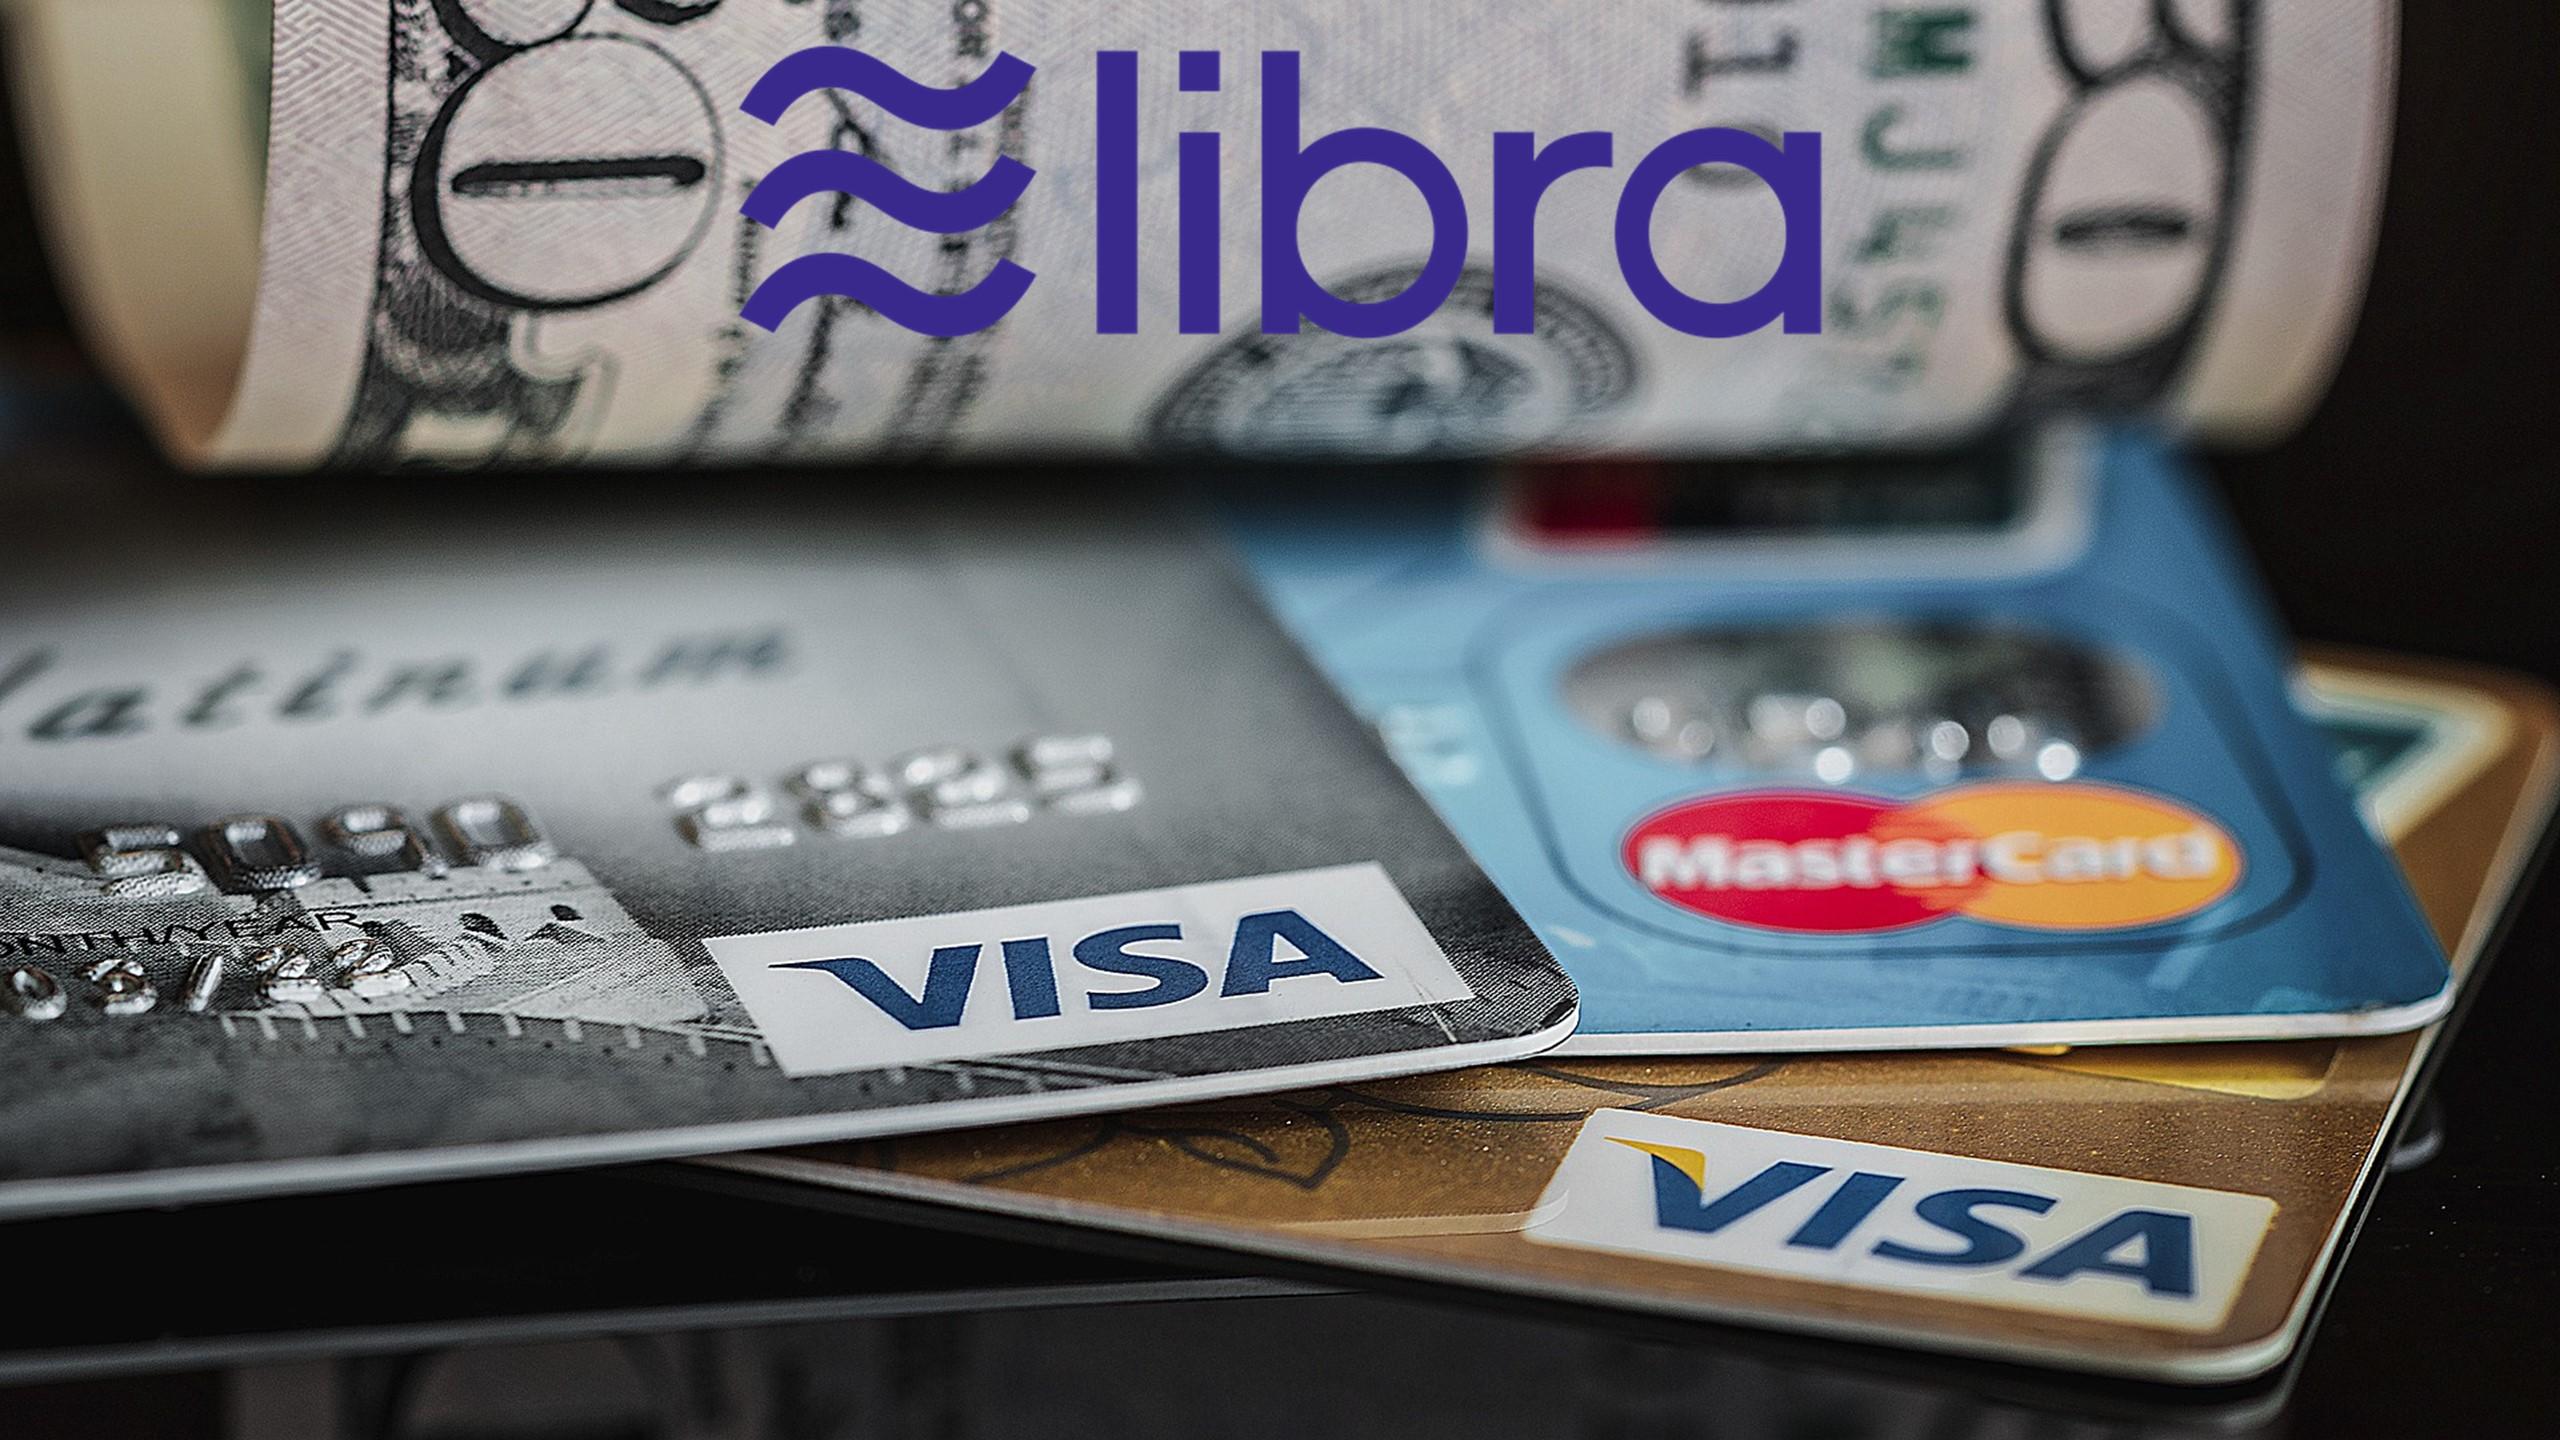 Visa-mastercard-Libra